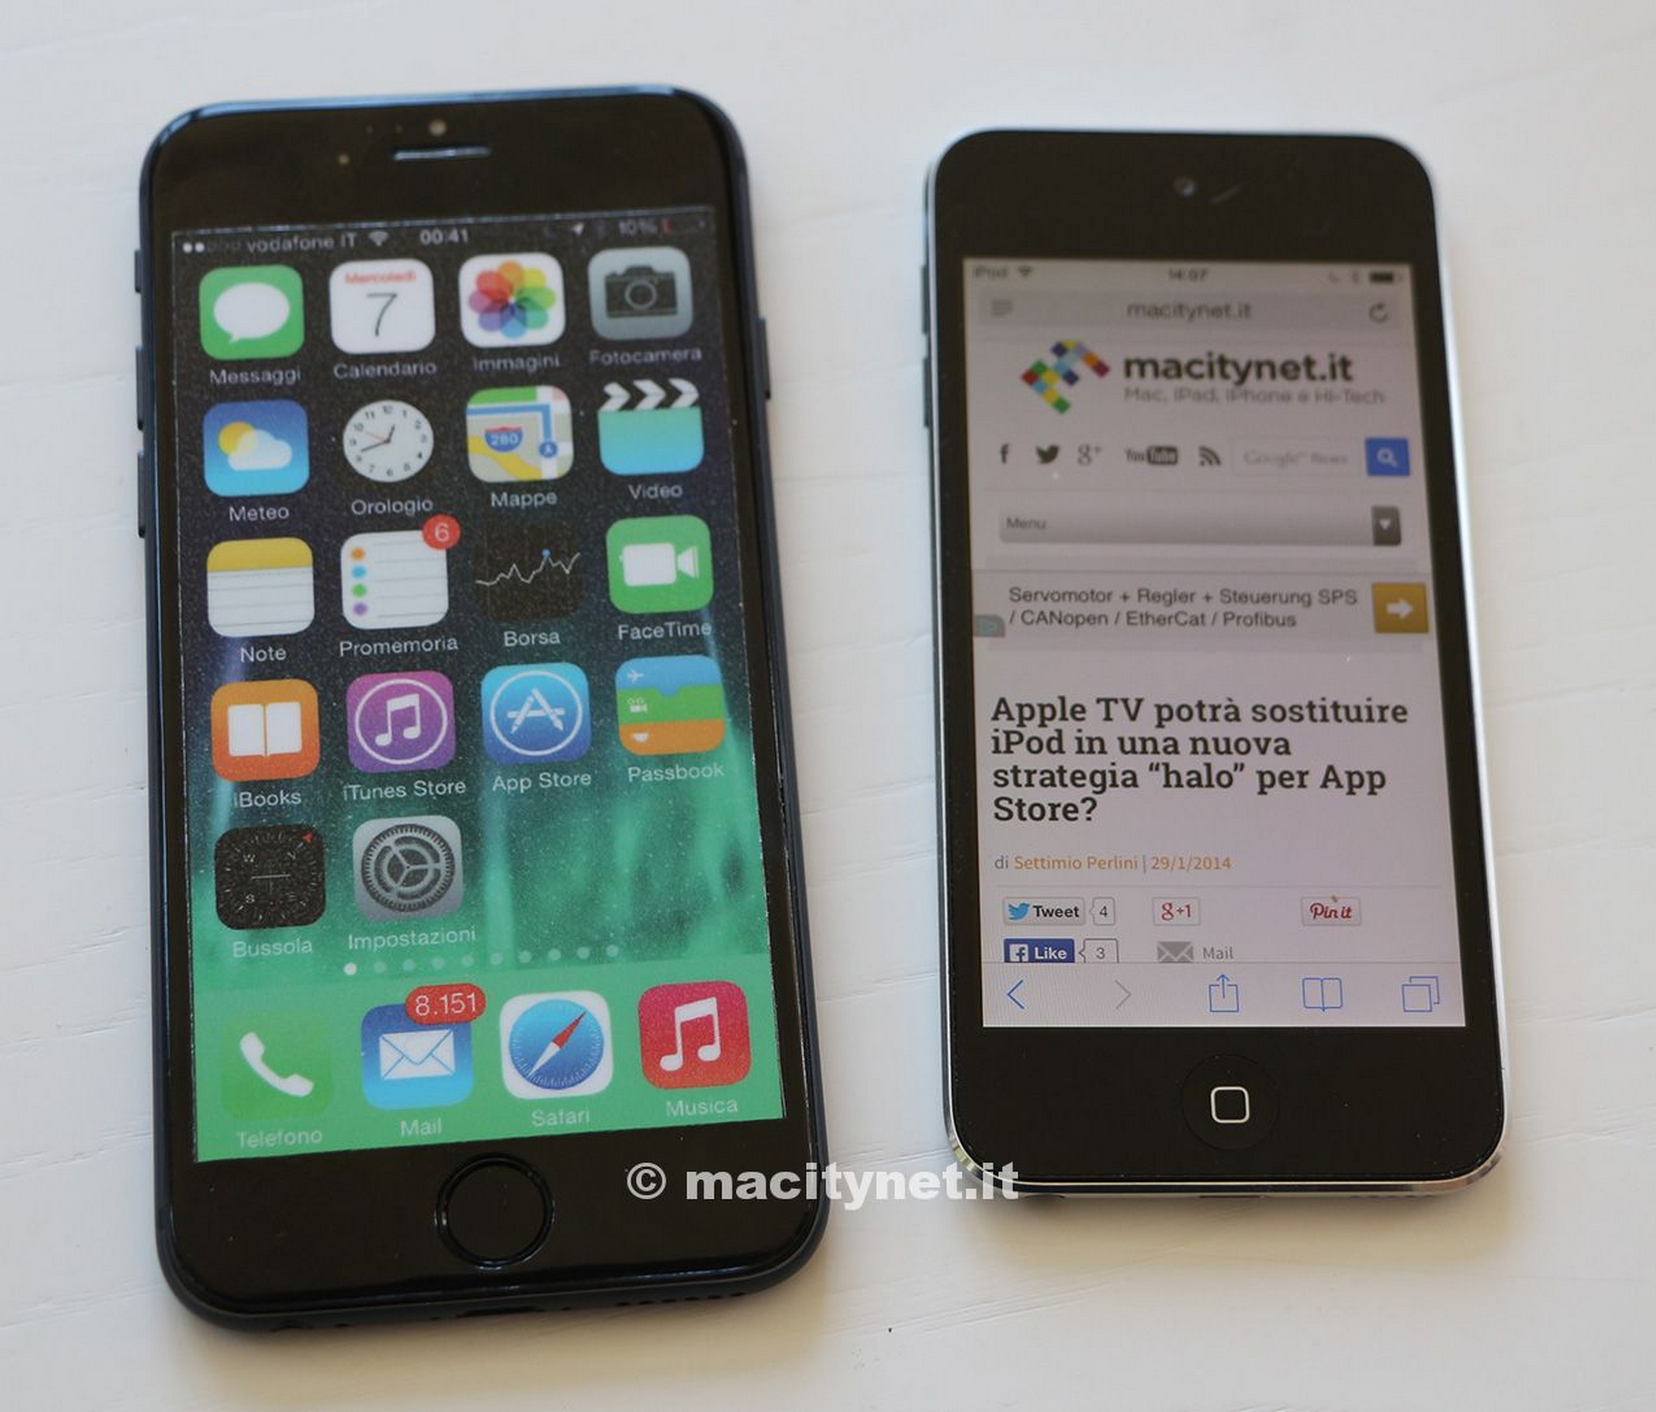 mockup-de-iphone--6-vs-ipod-touch-1